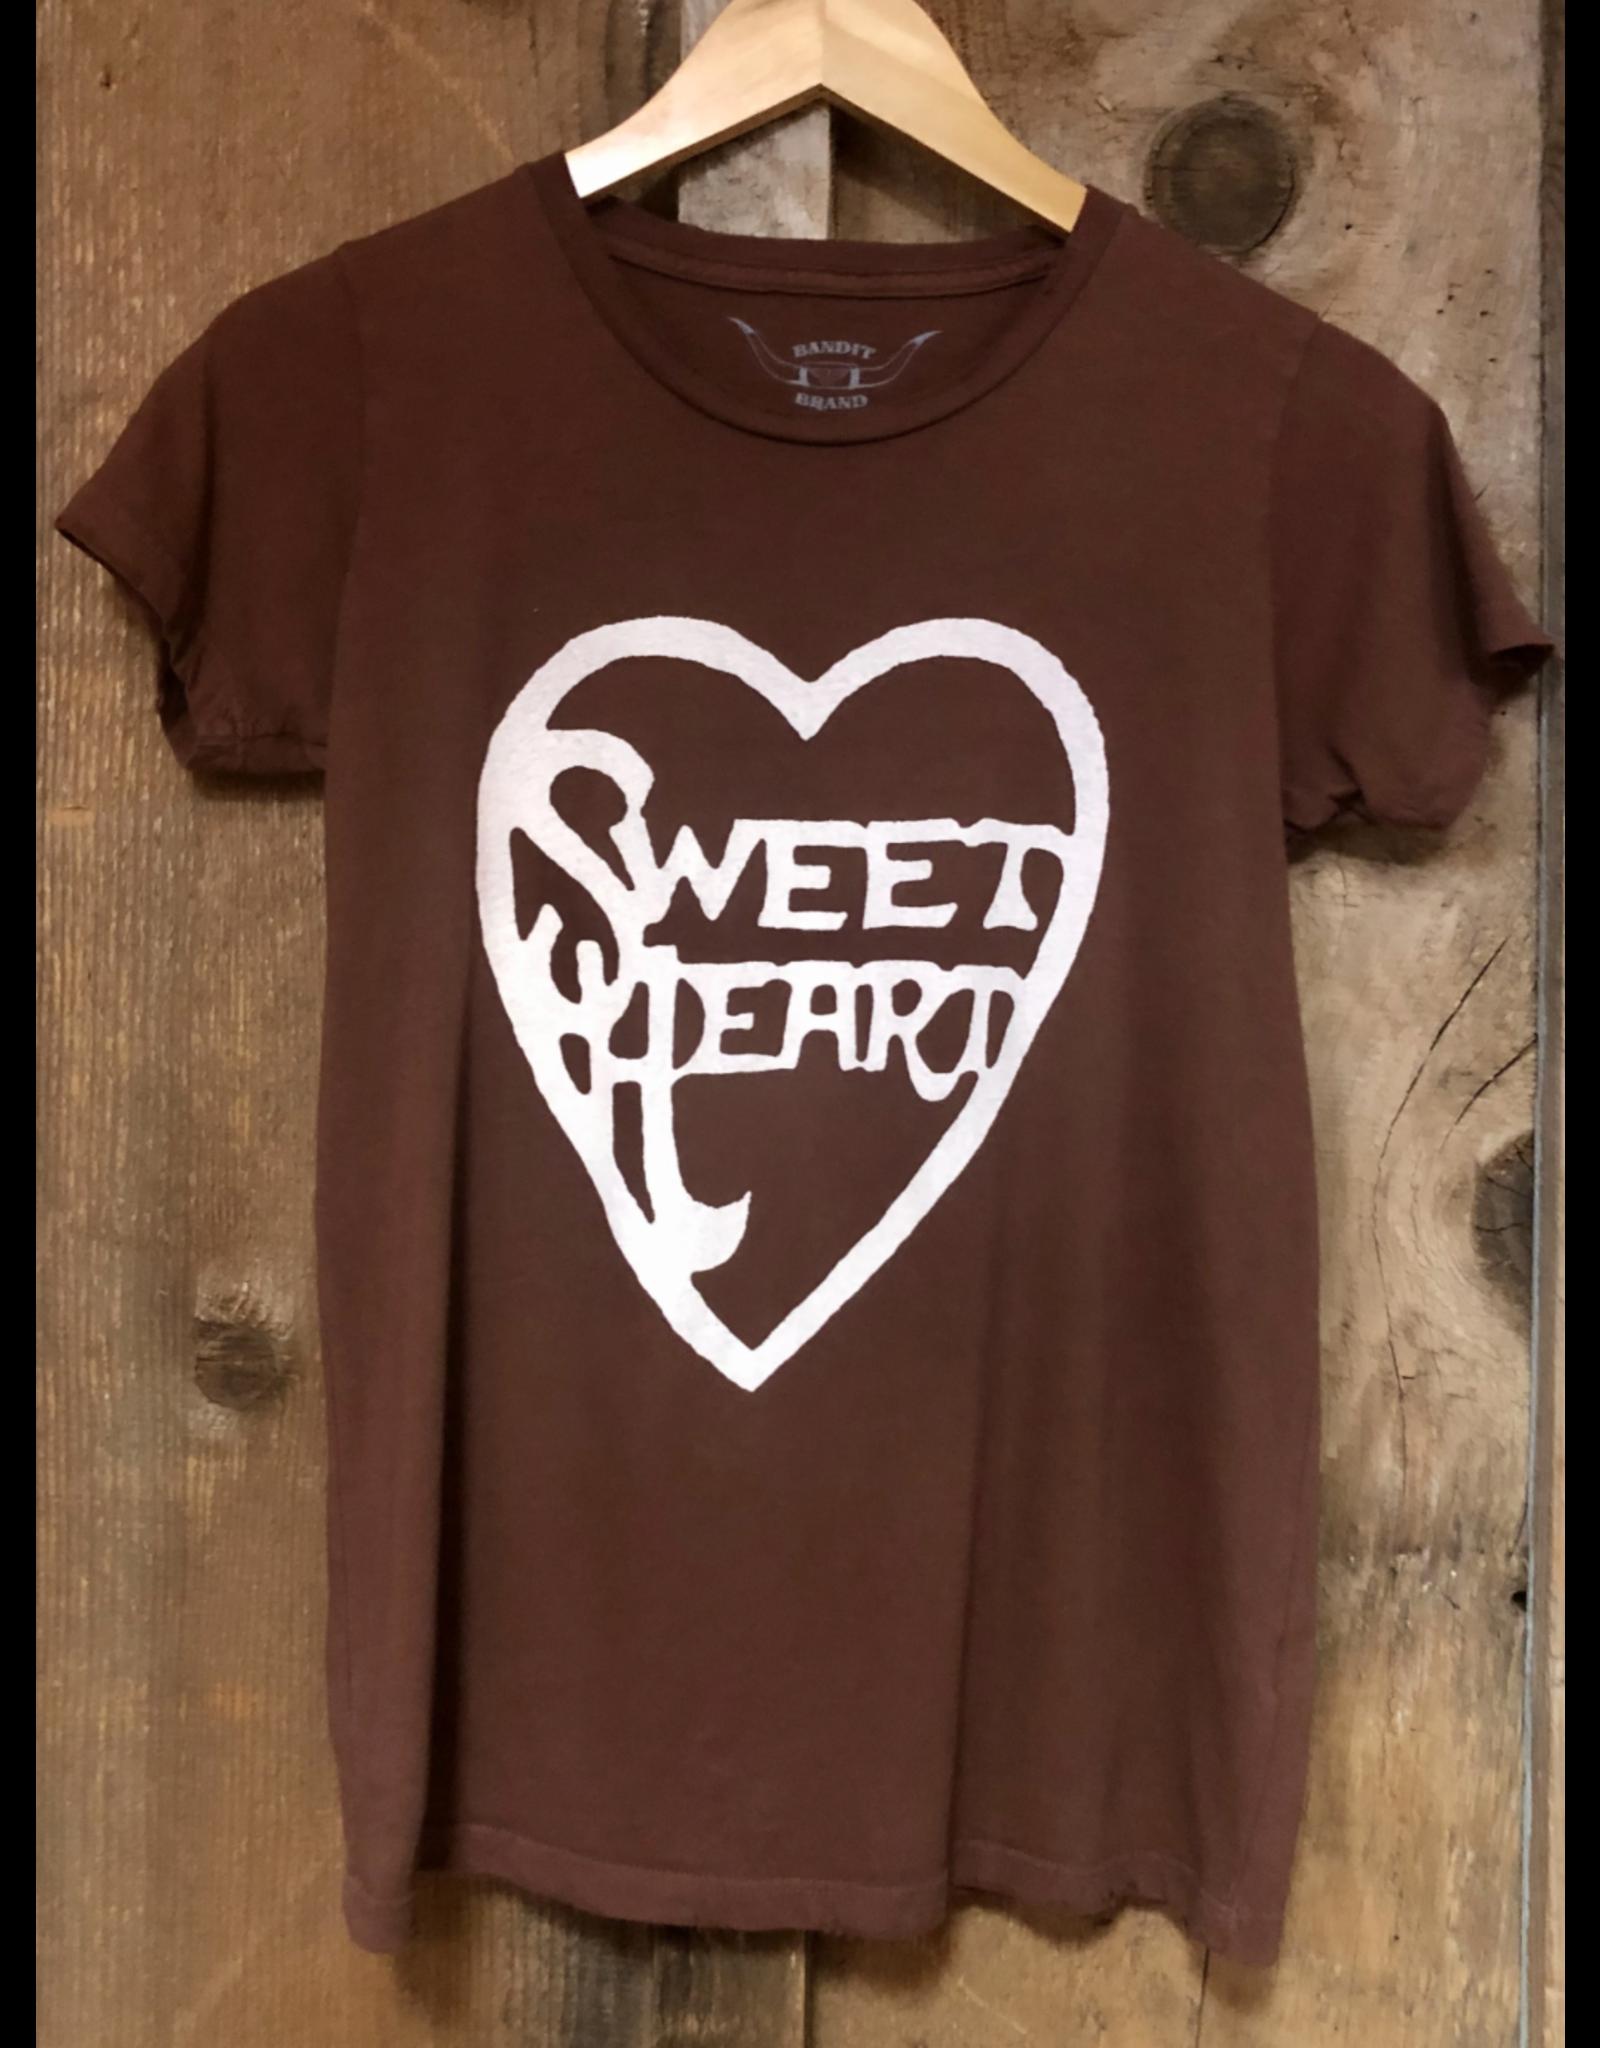 Bandit Bran Sweet Heart Tee